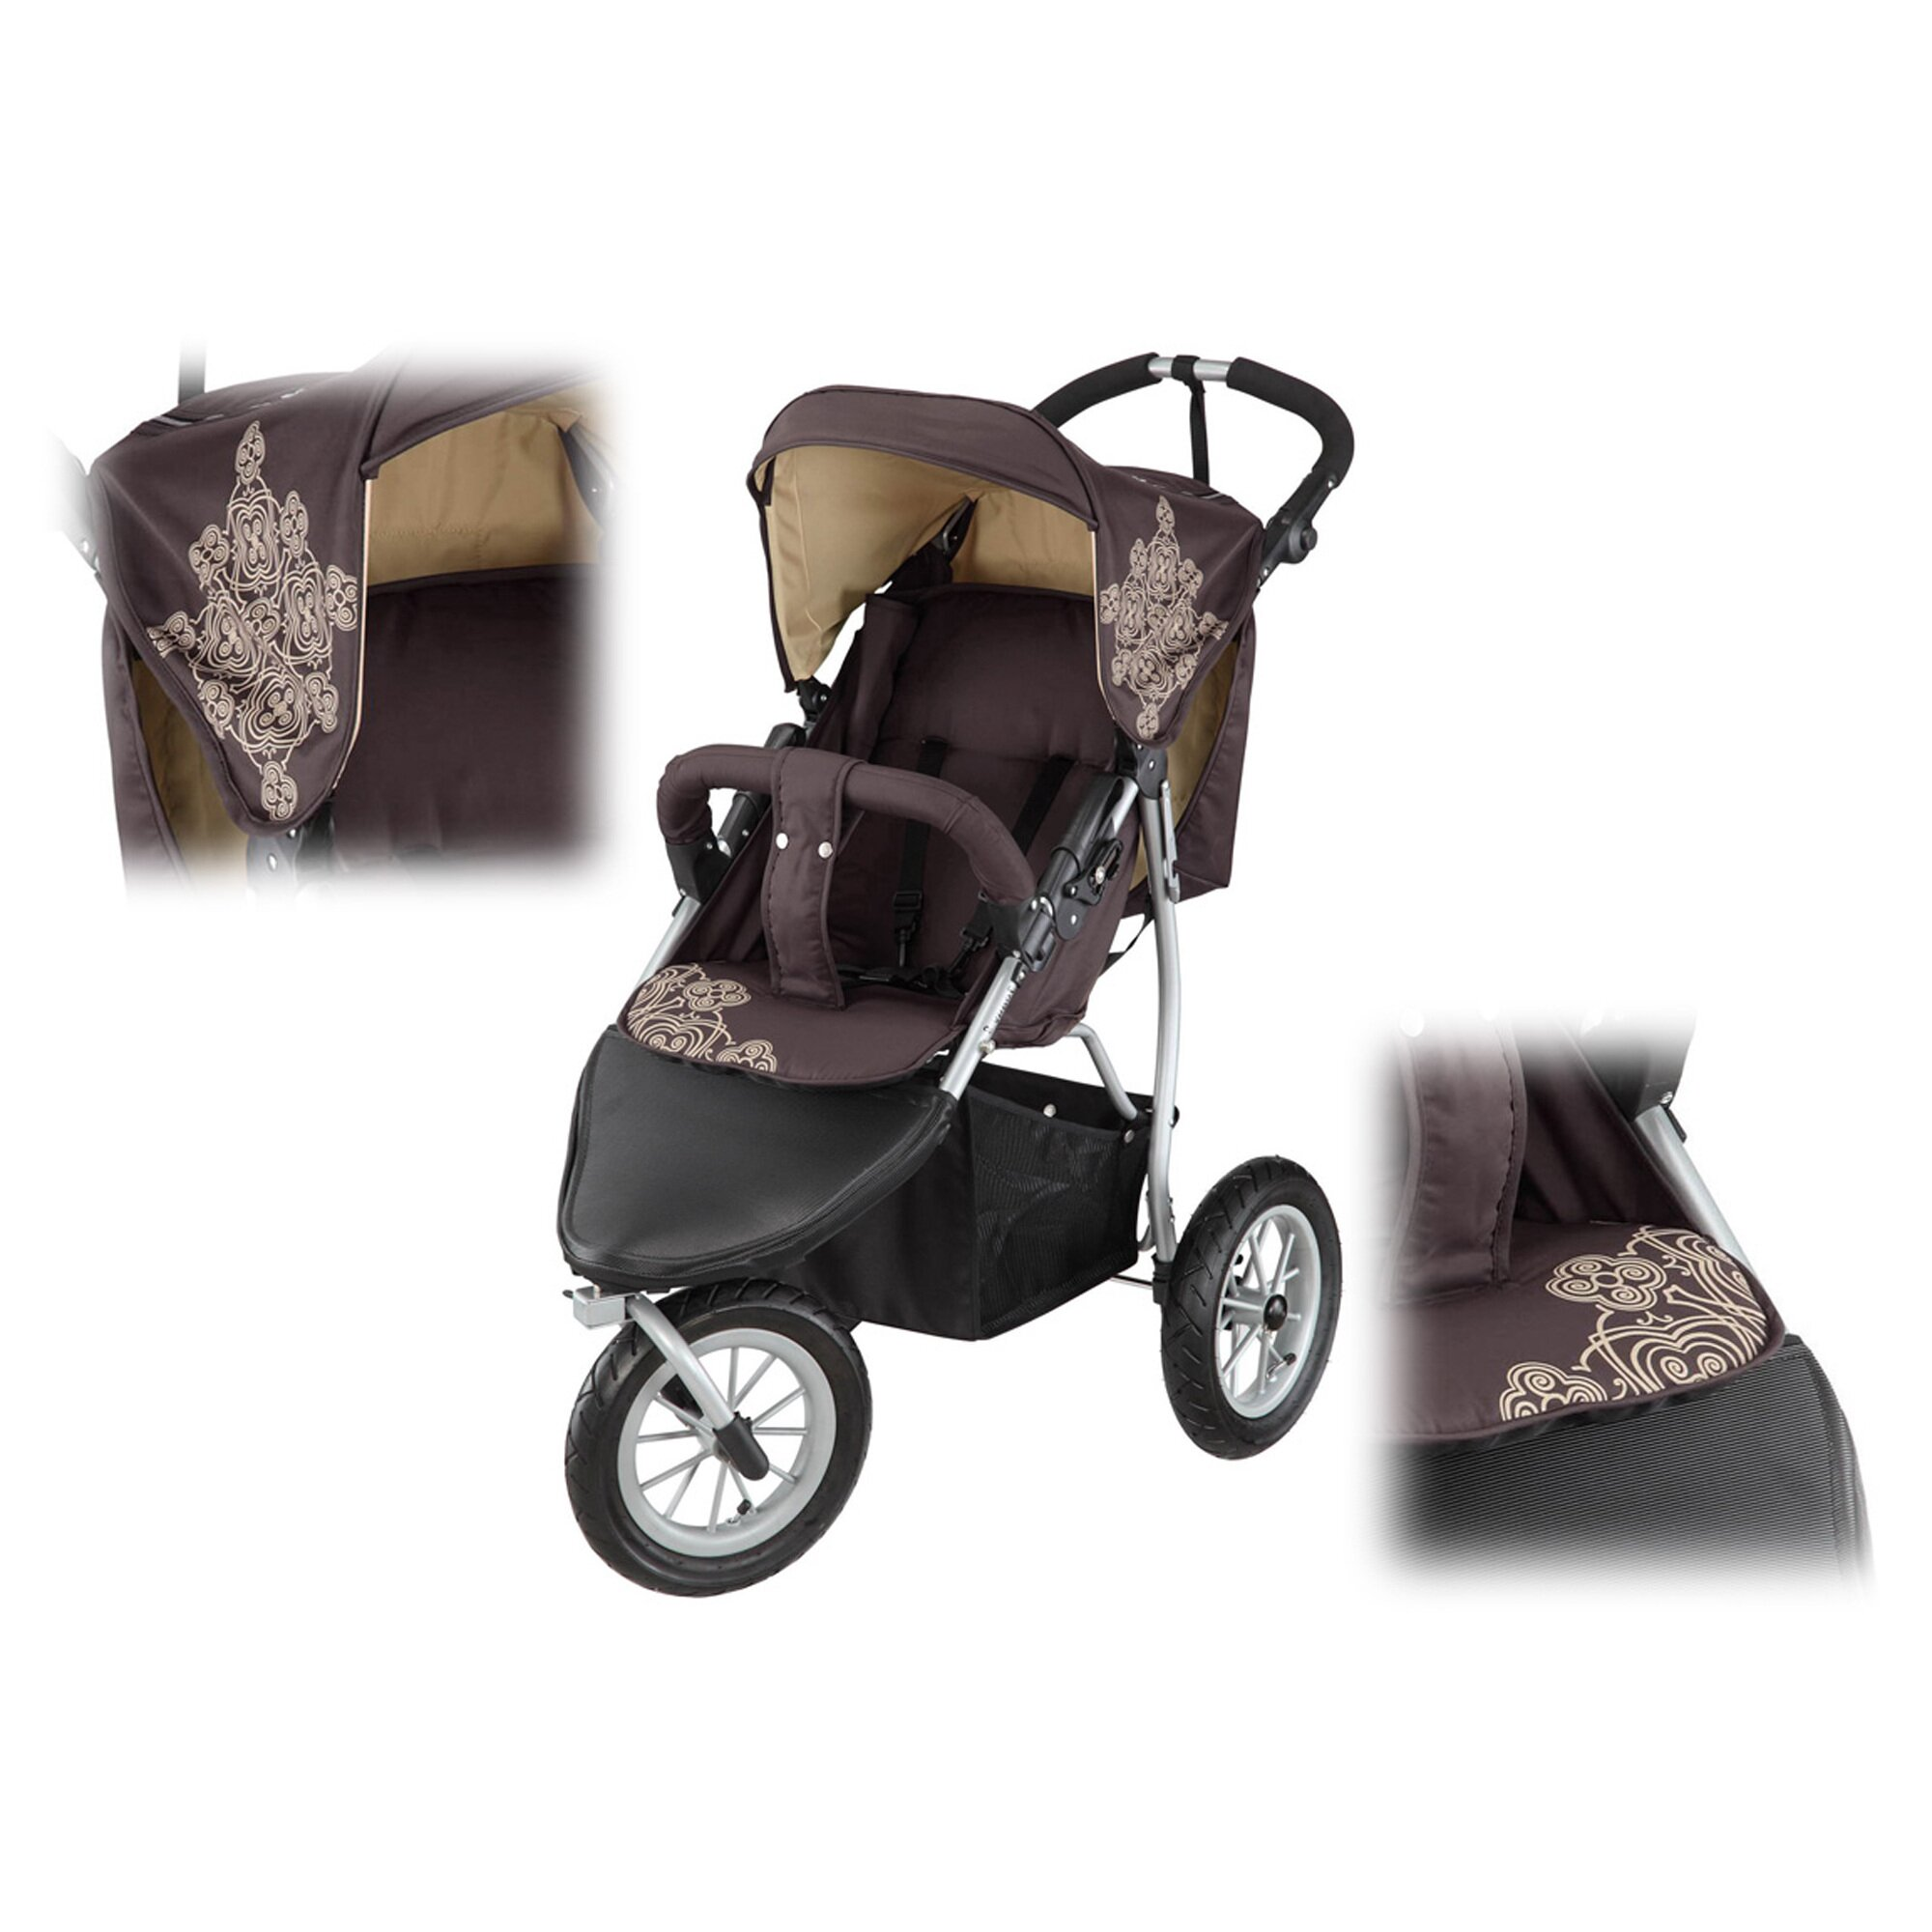 knorr-baby-kinderwagen-sportwagen-joggy-s-braun, 109.99 EUR @ babywalz-de